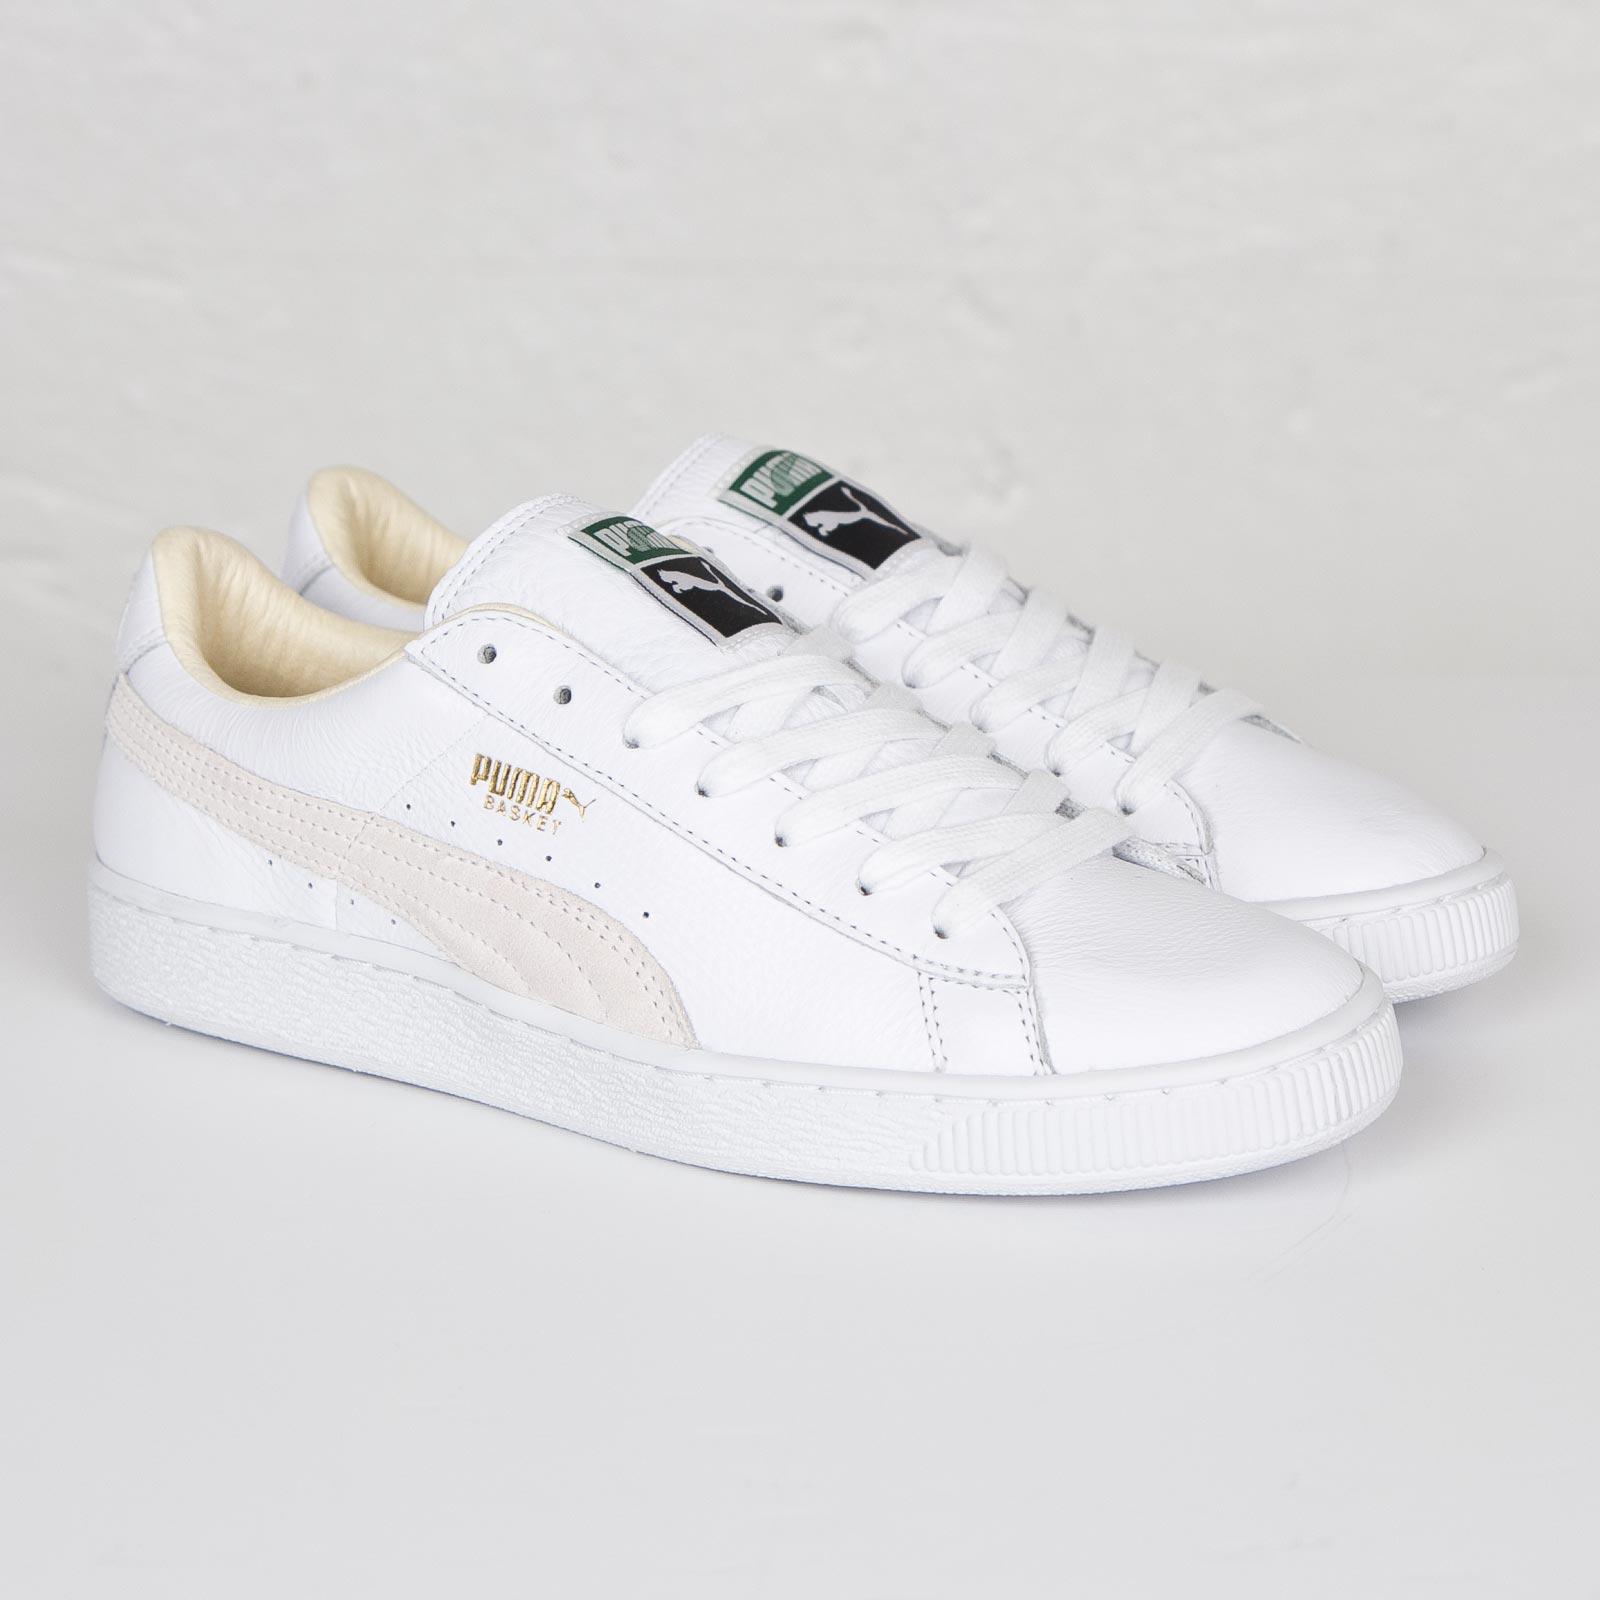 Puma Basket Classic - 351912-30 - SNS | sneakers & streetwear ...